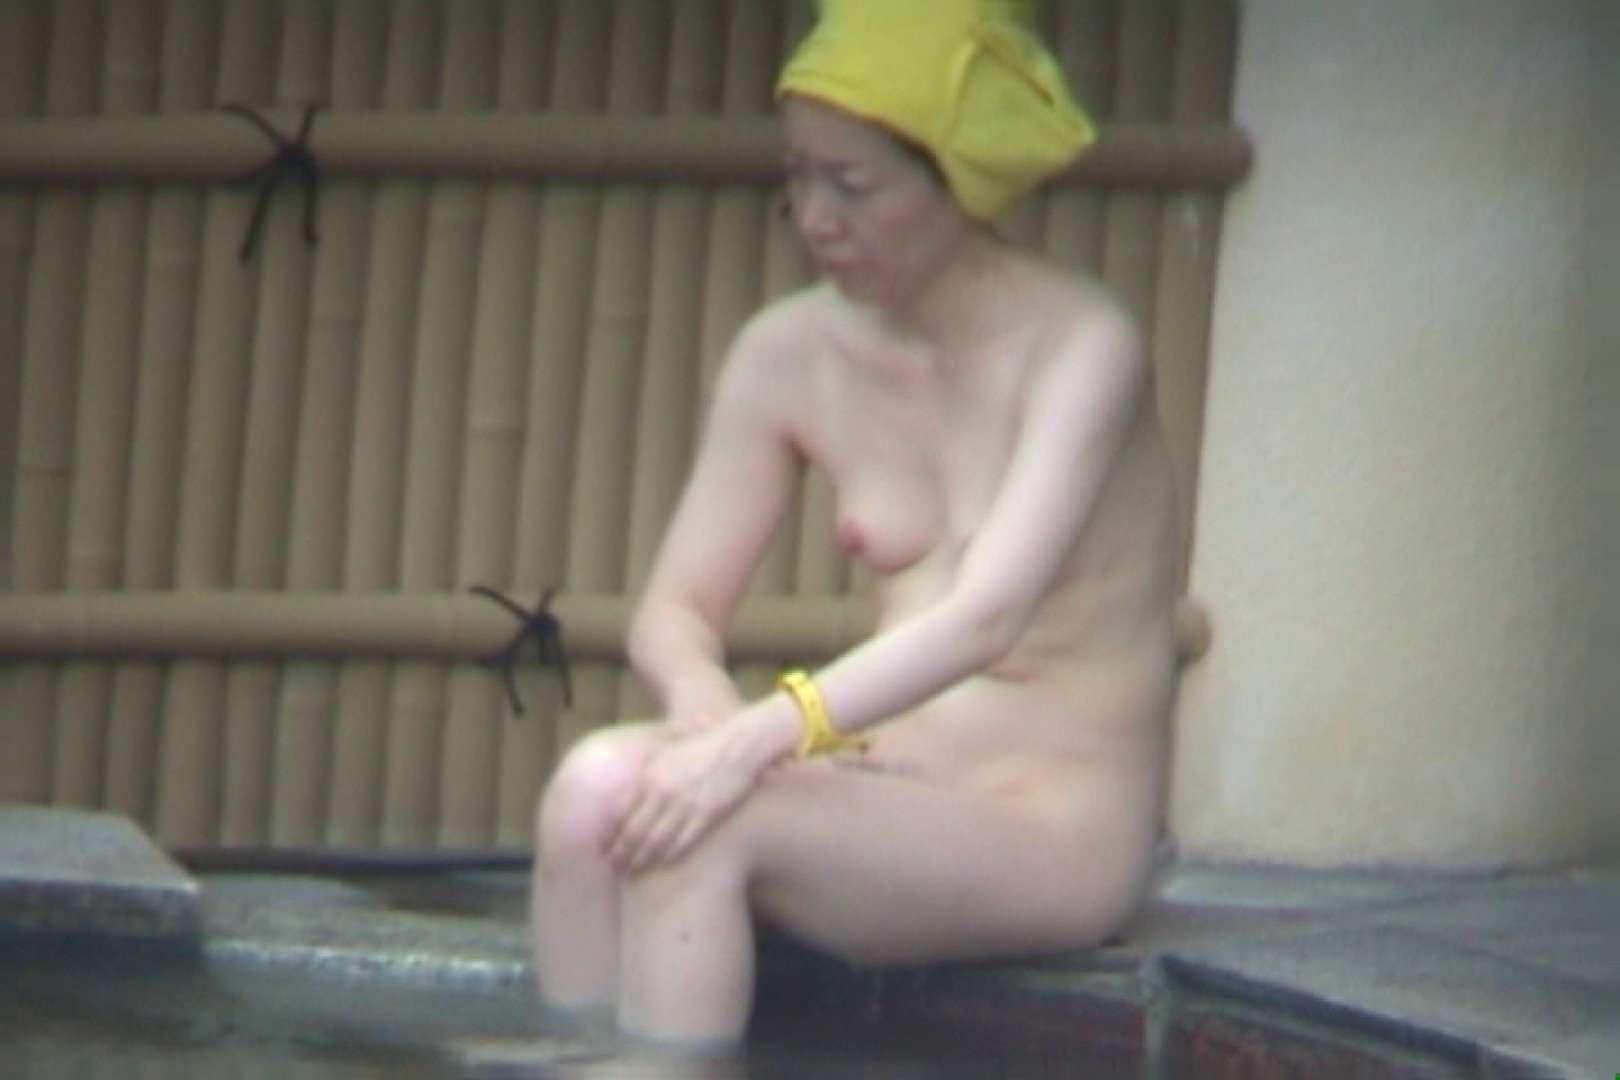 Aquaな露天風呂Vol.569 盗撮シリーズ | 露天風呂編  84PIX 61